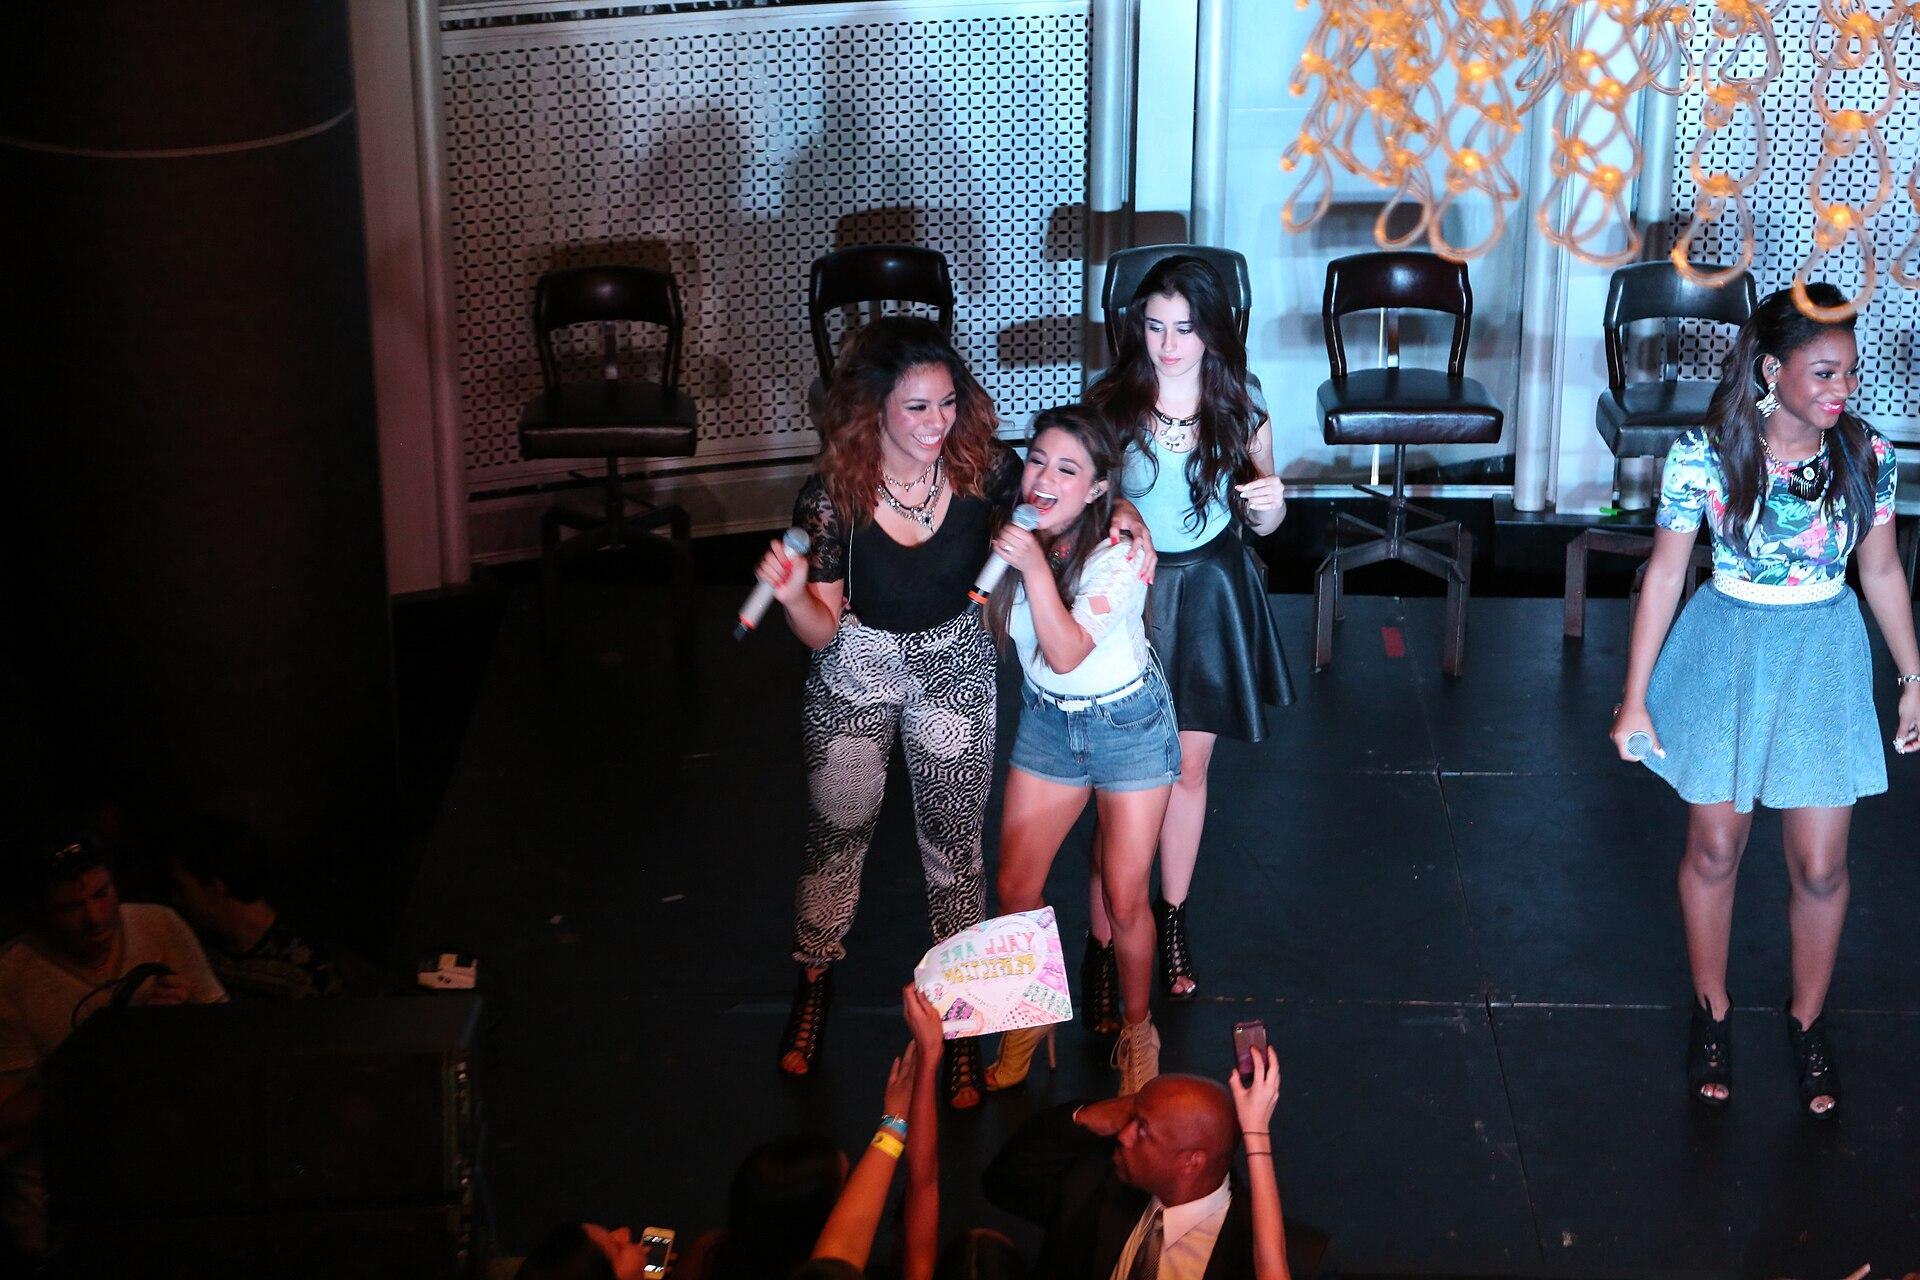 Camila cabello fifth harmony sexy dance - 2 part 5